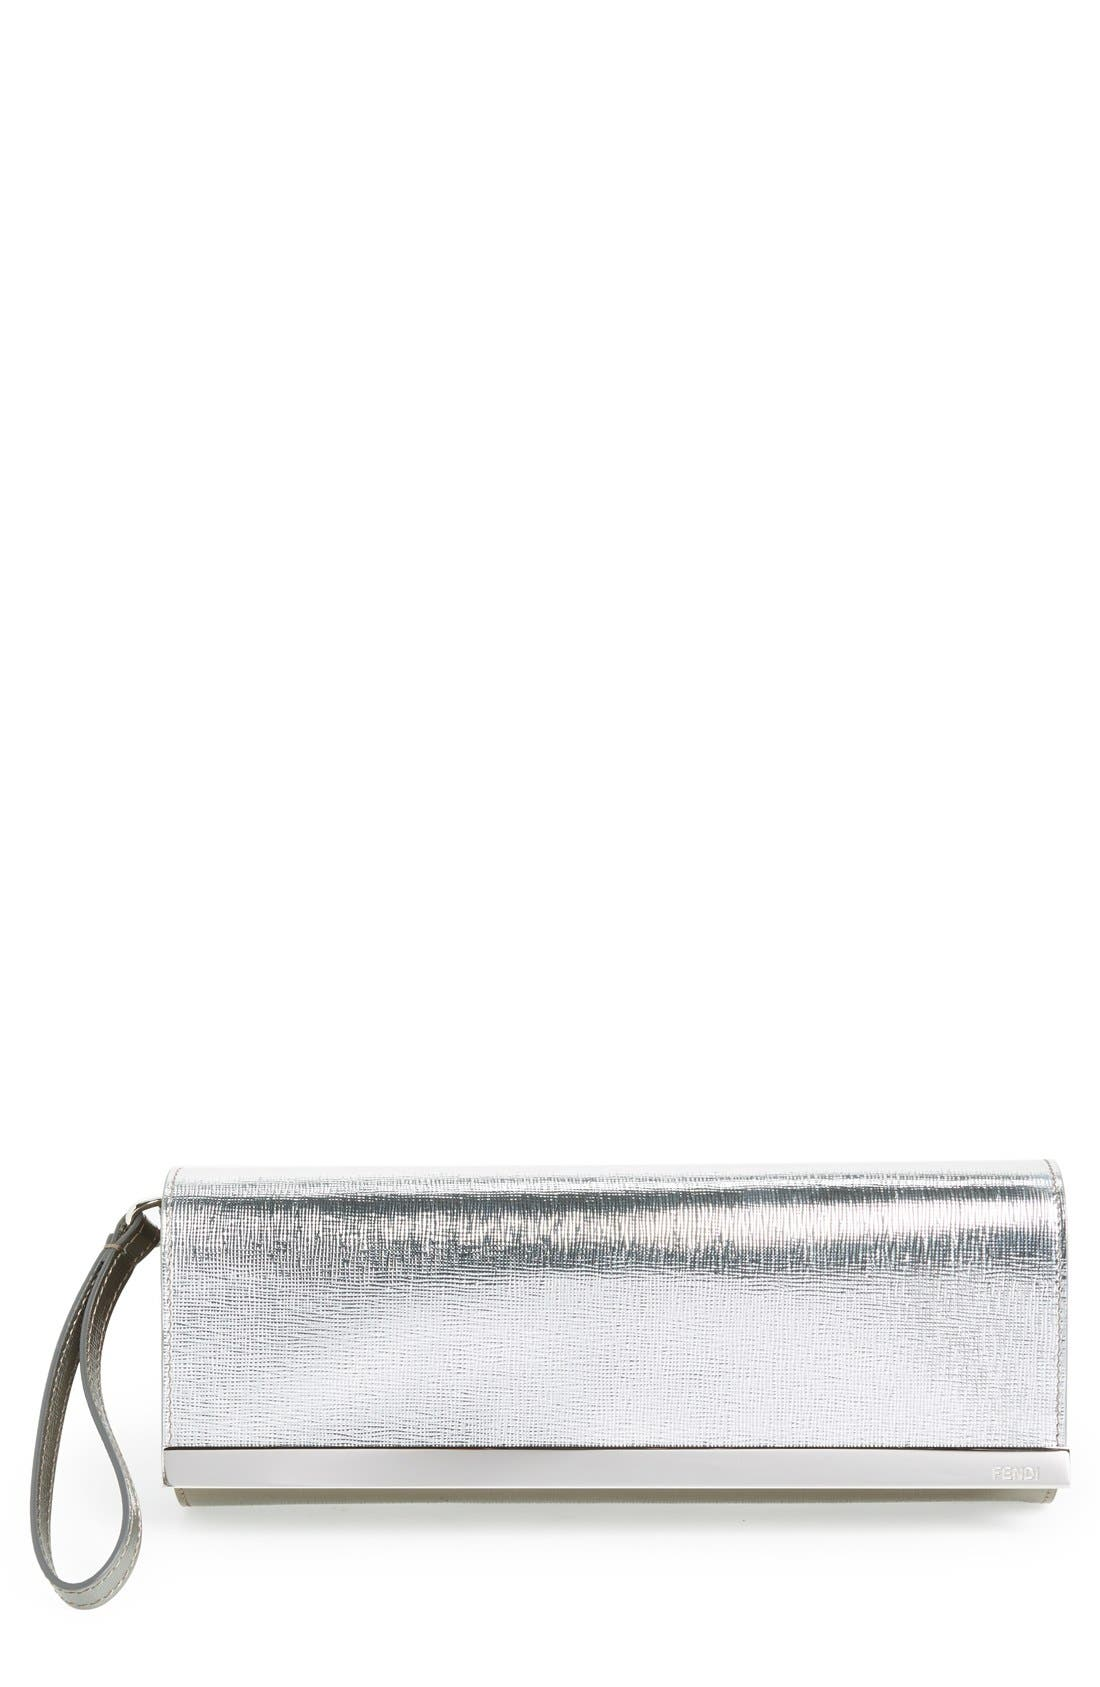 Main Image - Fendi 'Vernice Bicolor Rush' Metallic Leather Pochette Clutch